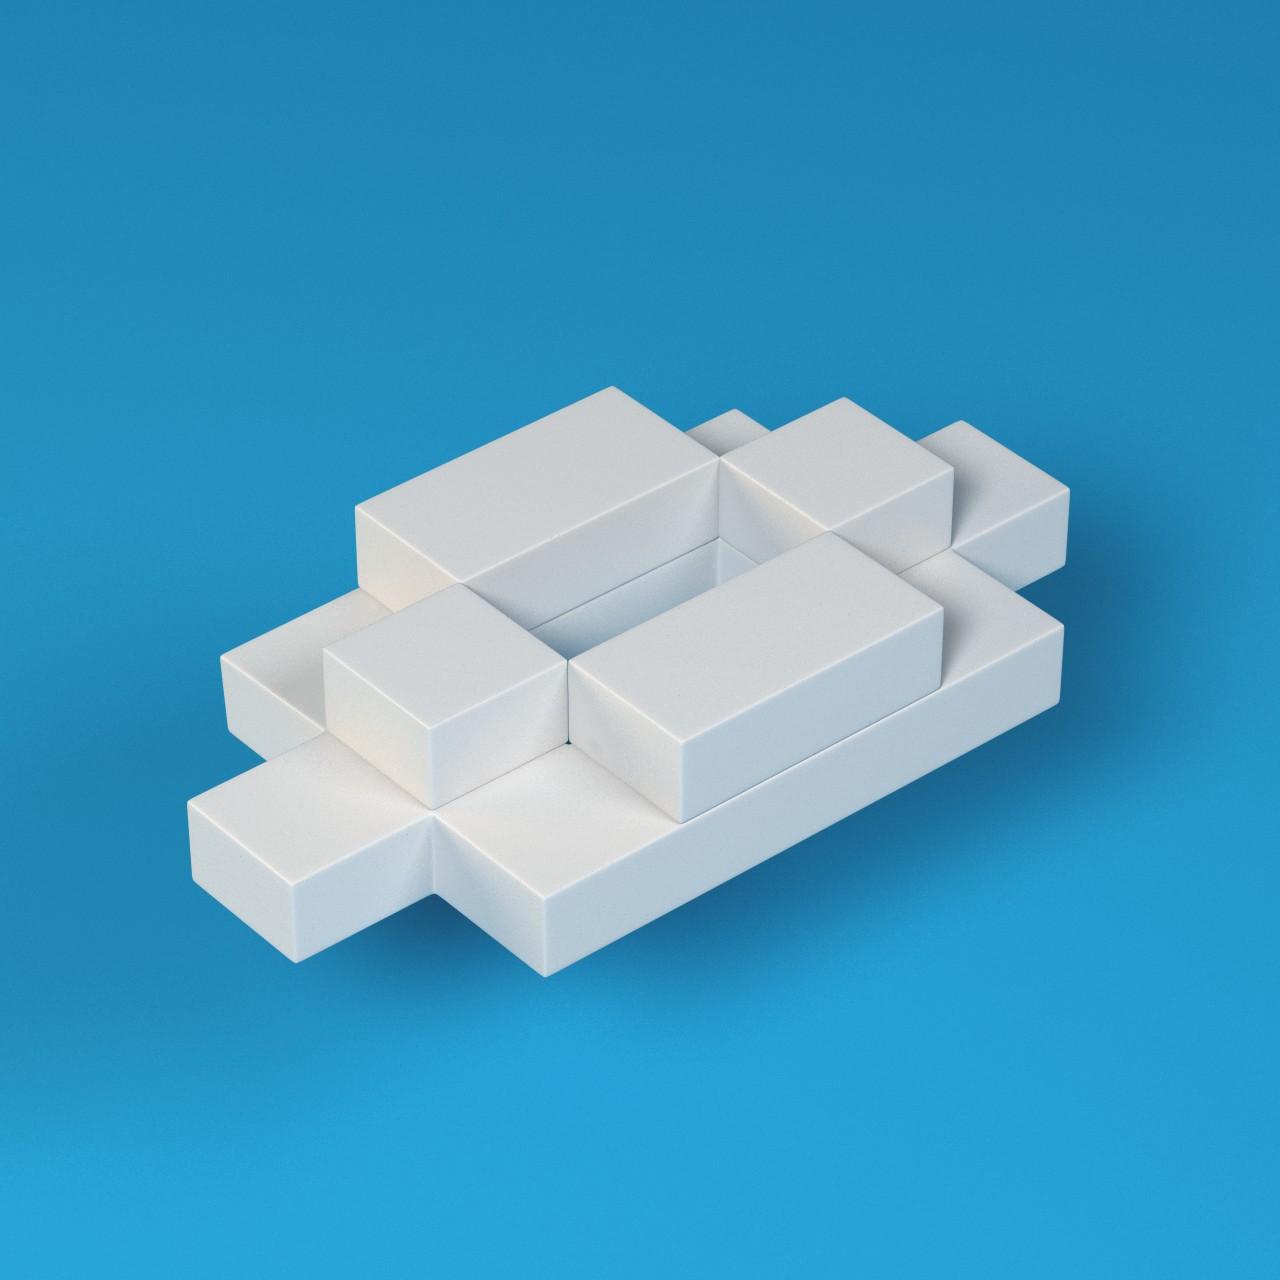 cube_cloud_2_1.jpg